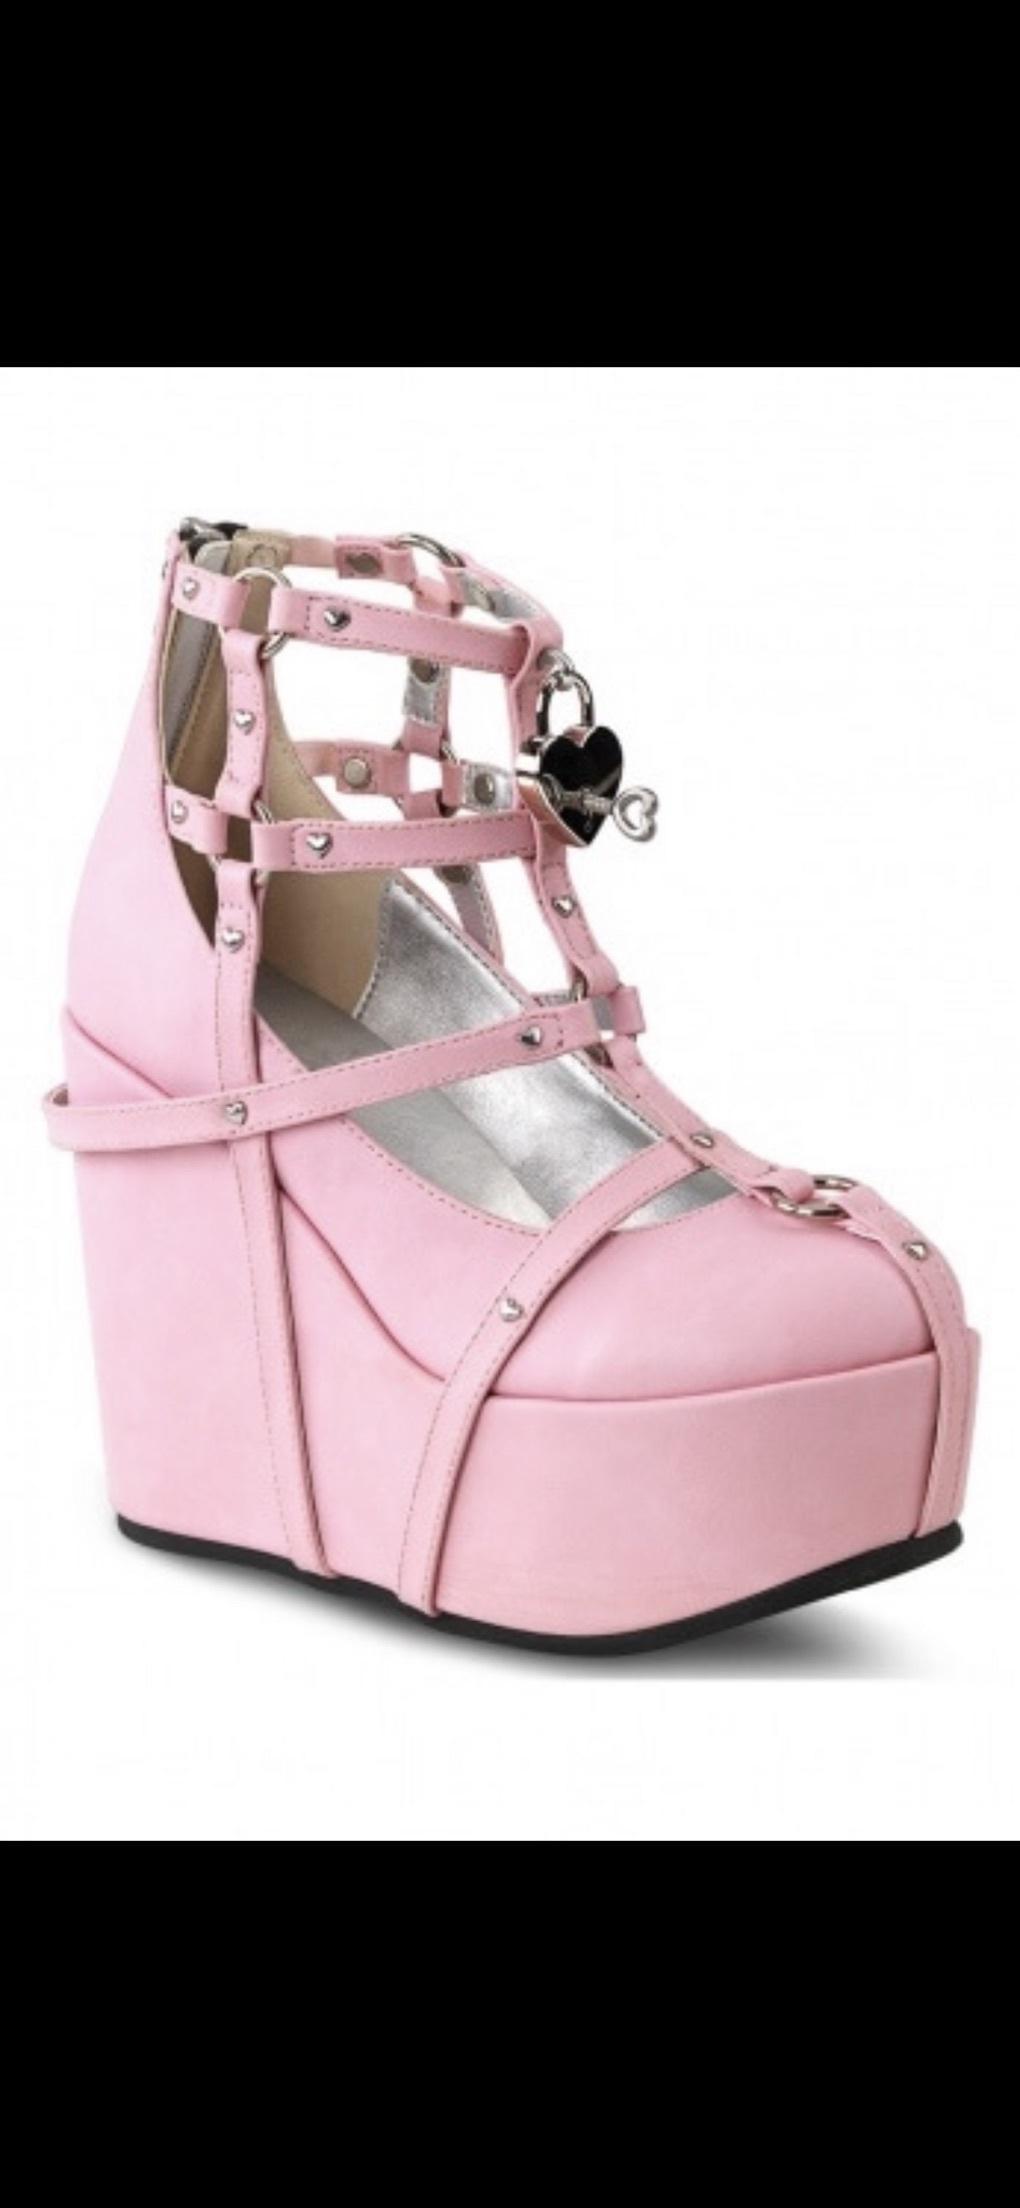 shoes pink pastel goth platform shoes high heels